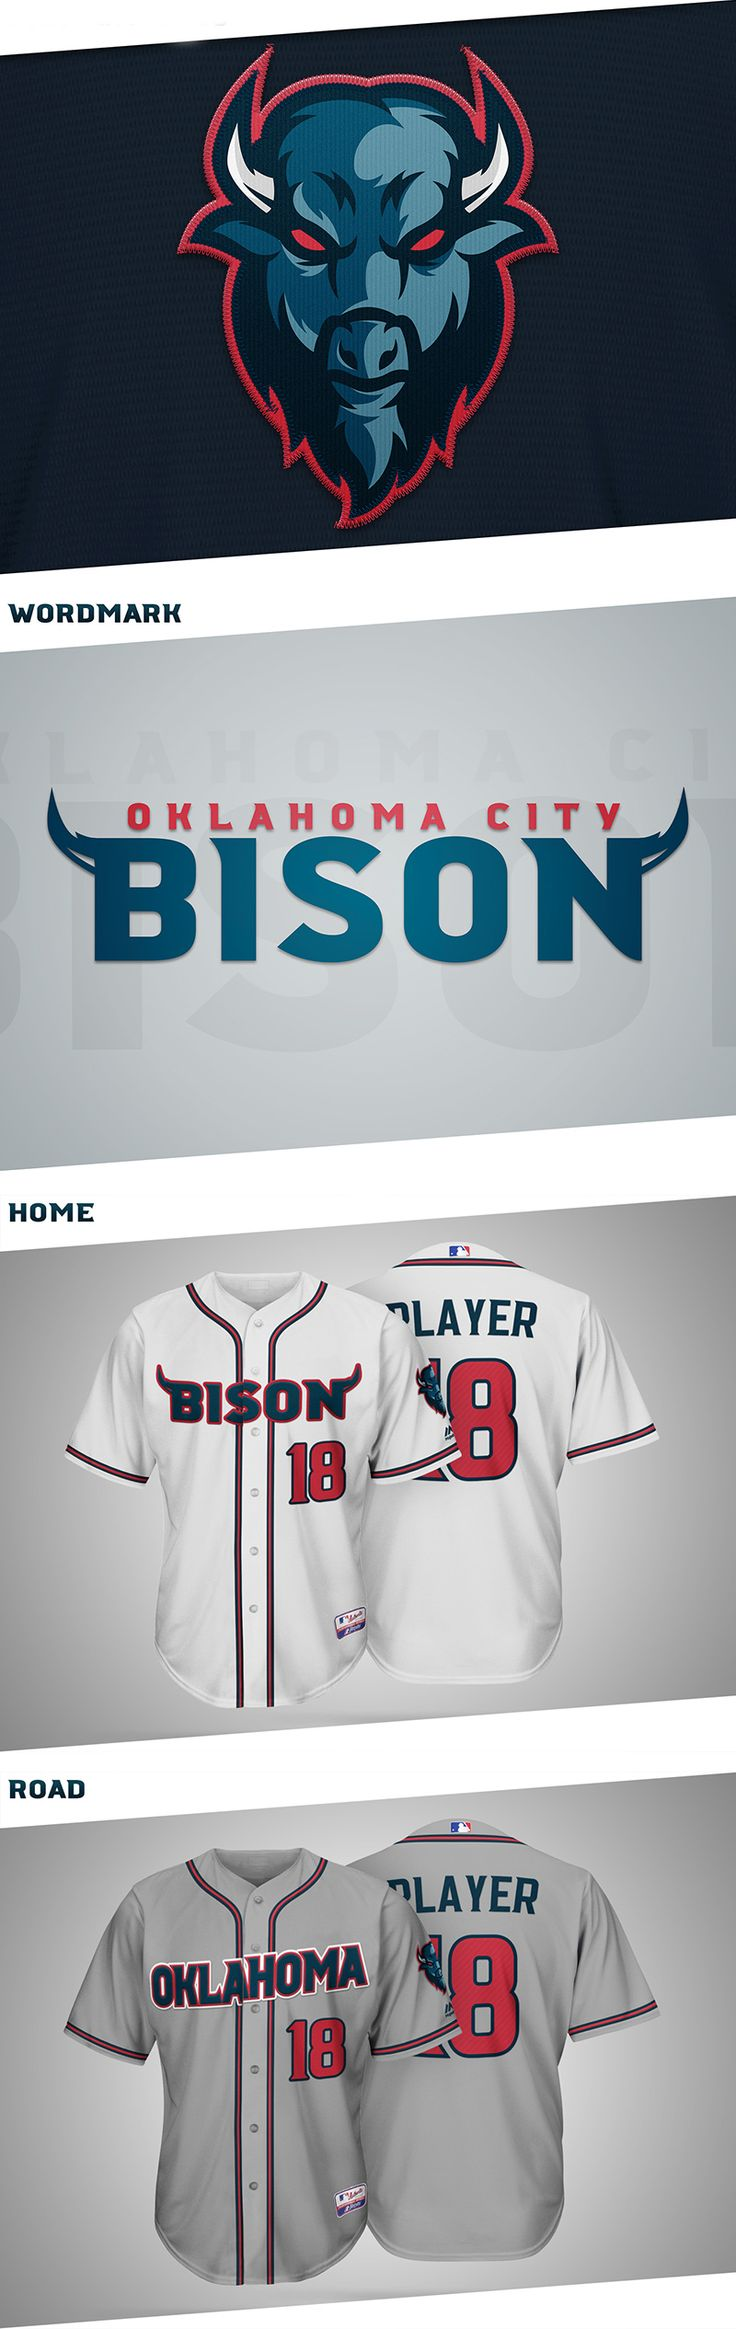 OKC Bison MLB Expansion Team Concept by Ryan Lane